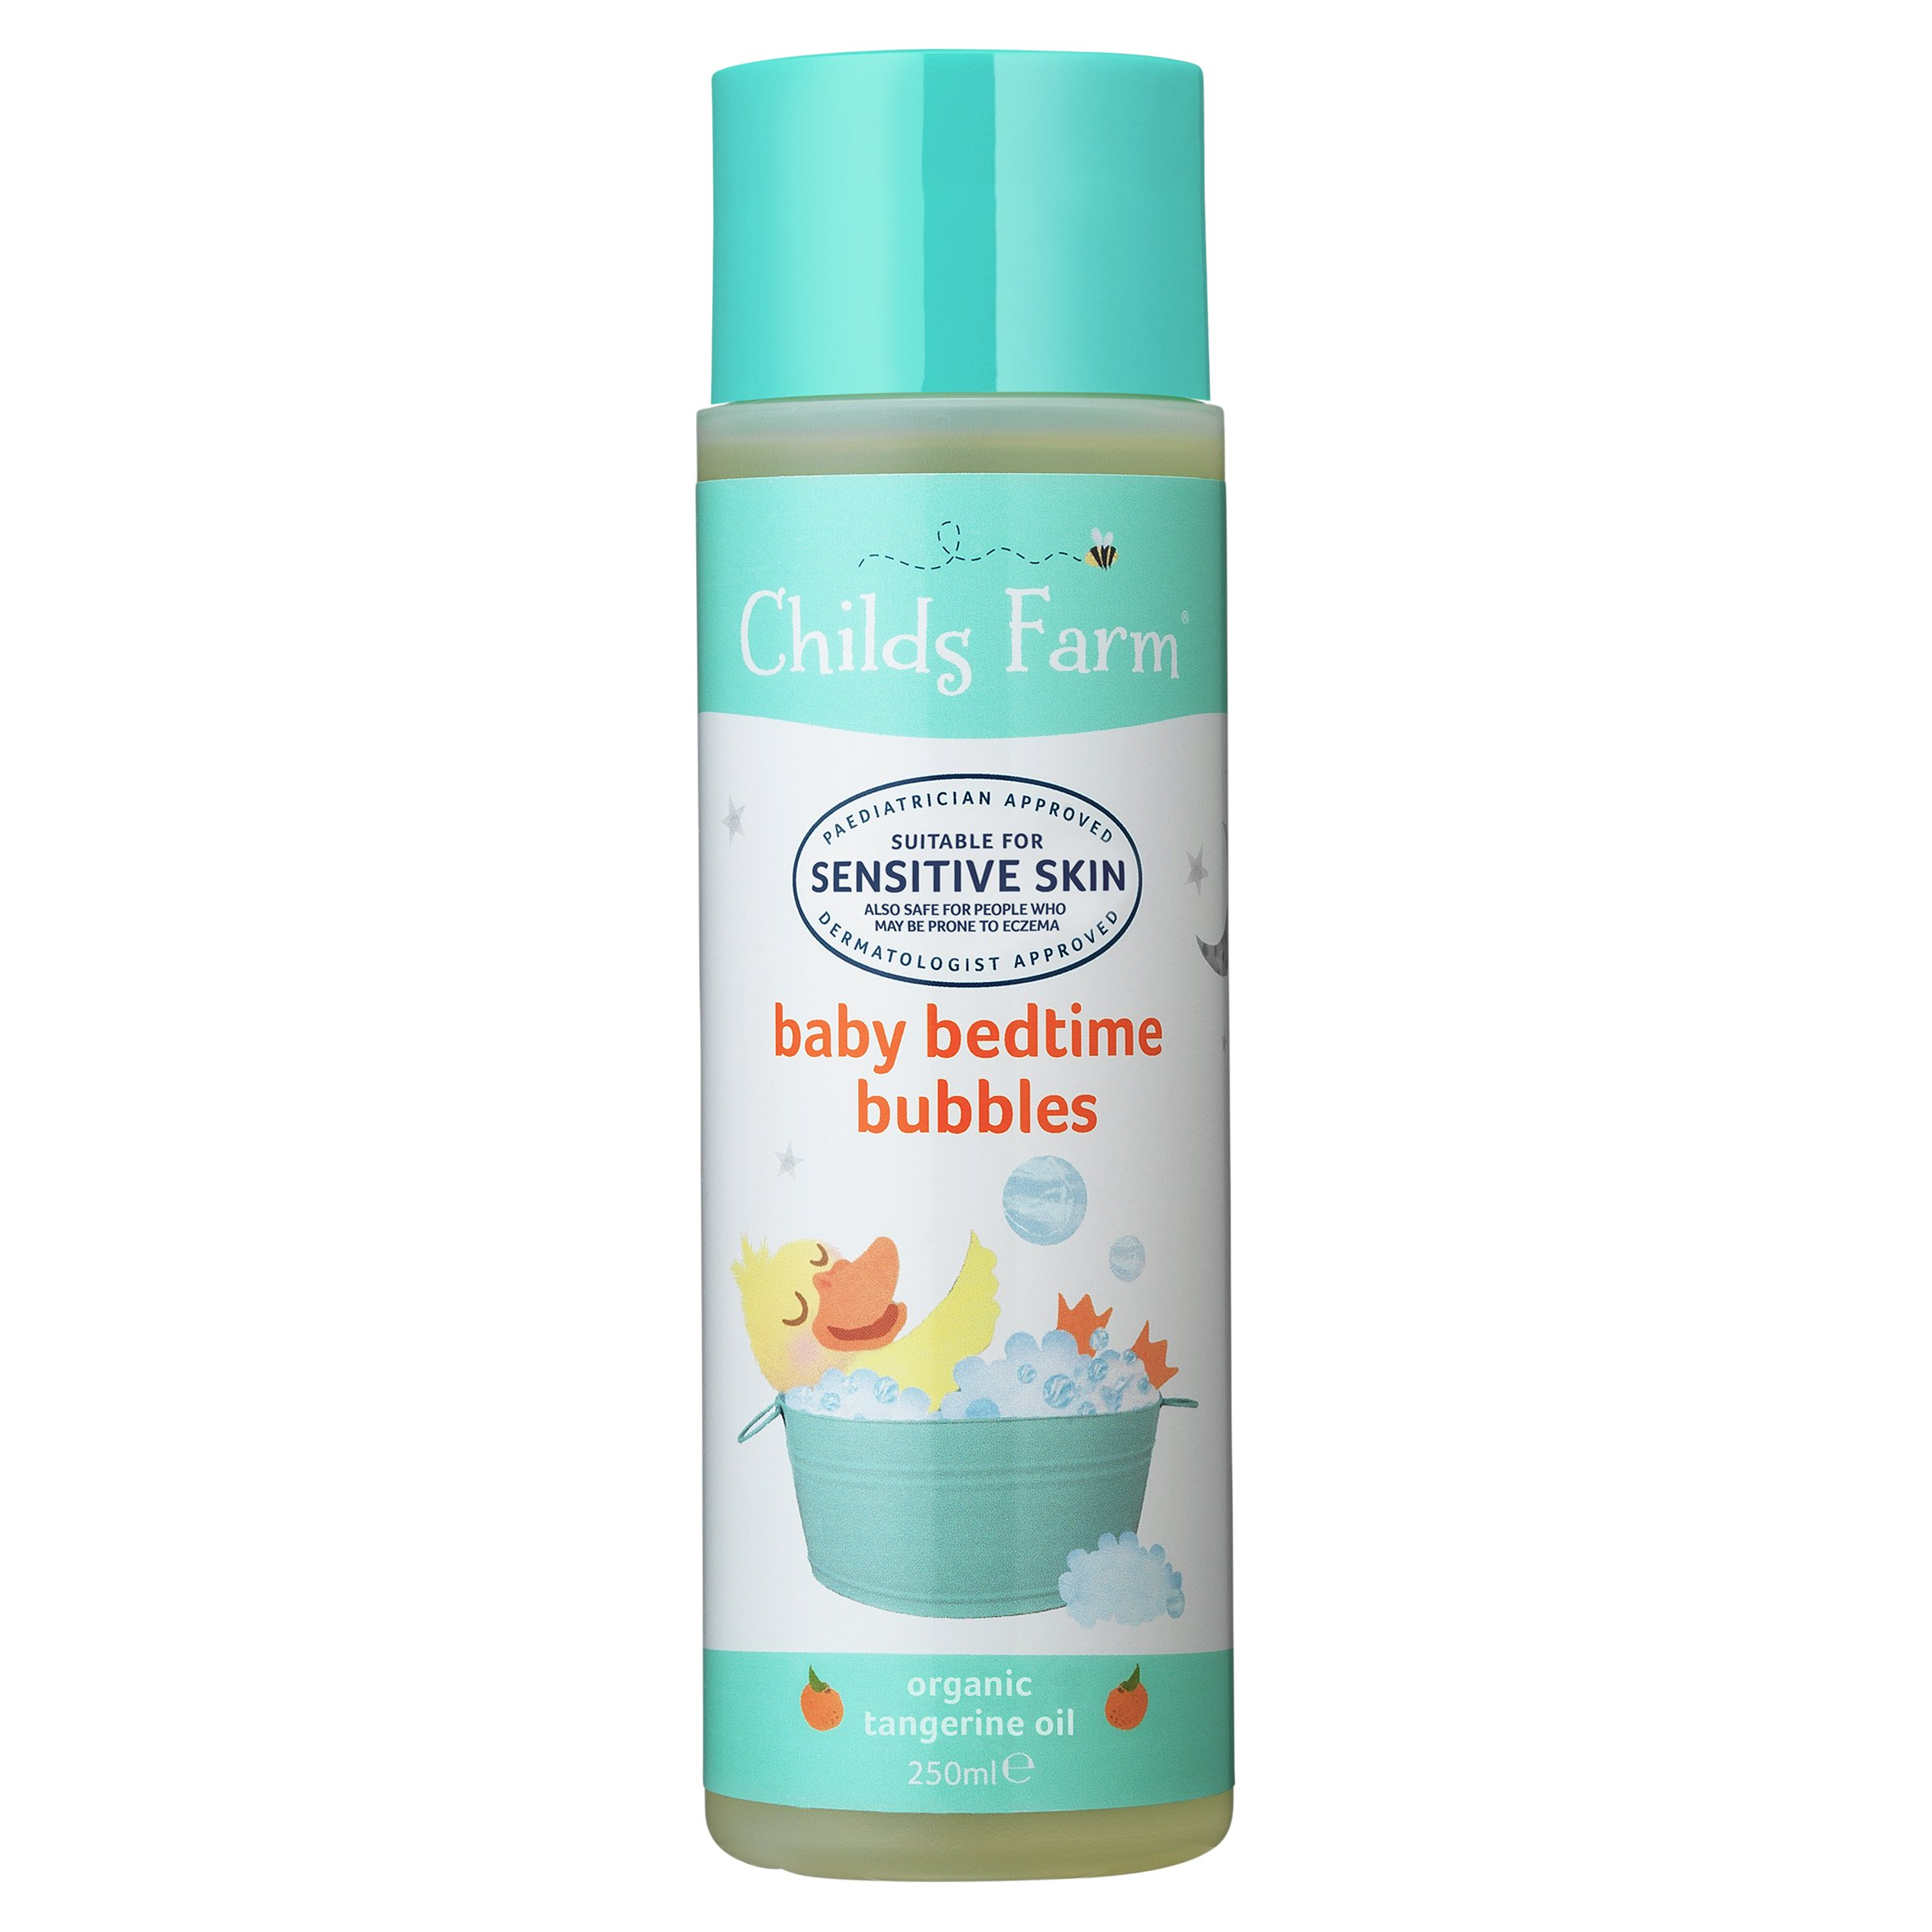 Childs Farm Organic Baby Bedtime Tangerine Bubble Bath 250Ml